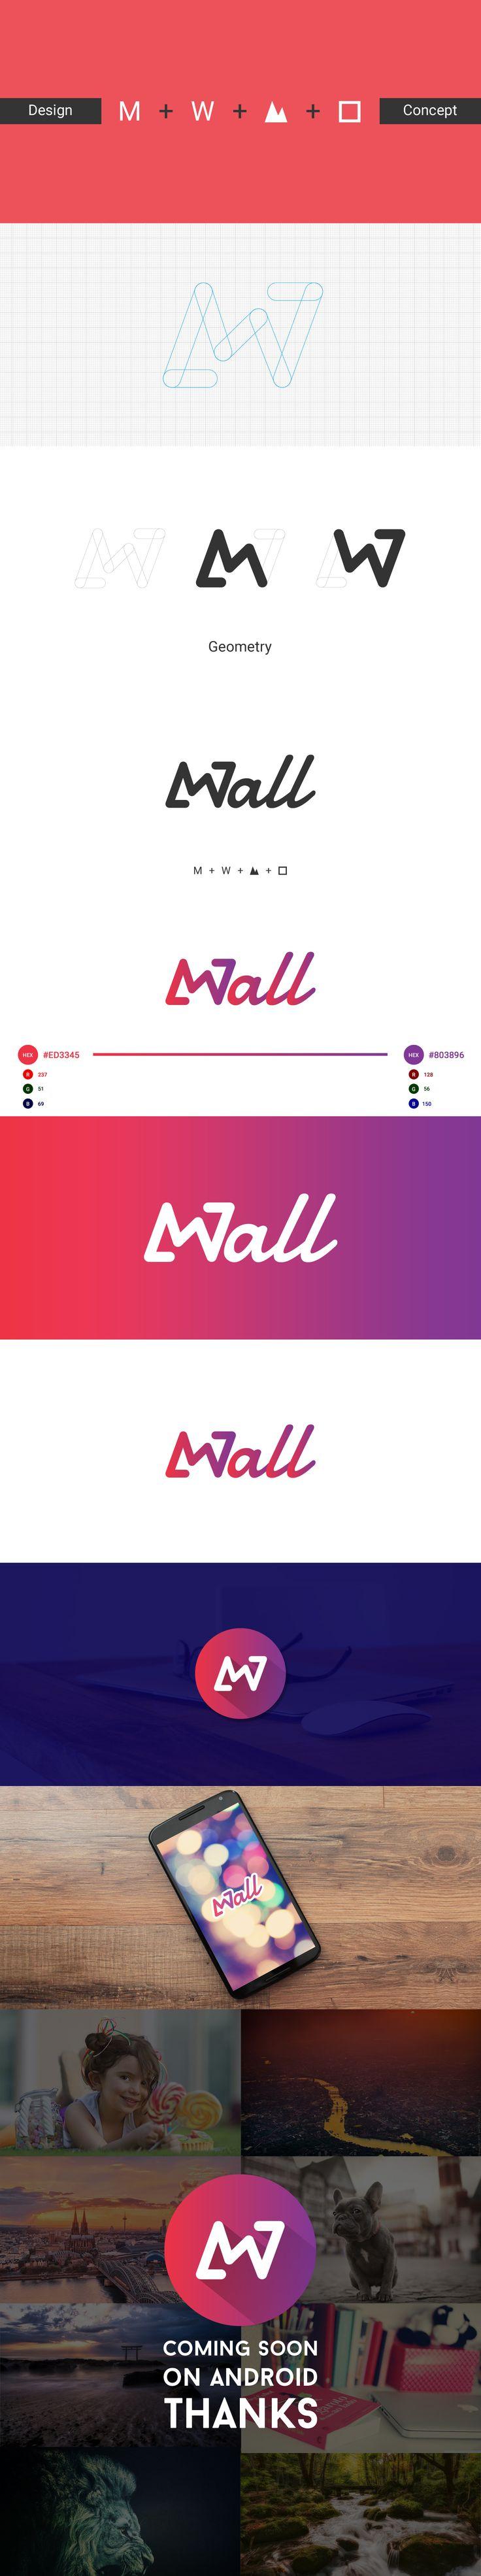 MWall Mobile App Logo Design View More on Behance https://www.behance.net/gallery/29010603/MWall-Mobile-App-Logo-Design